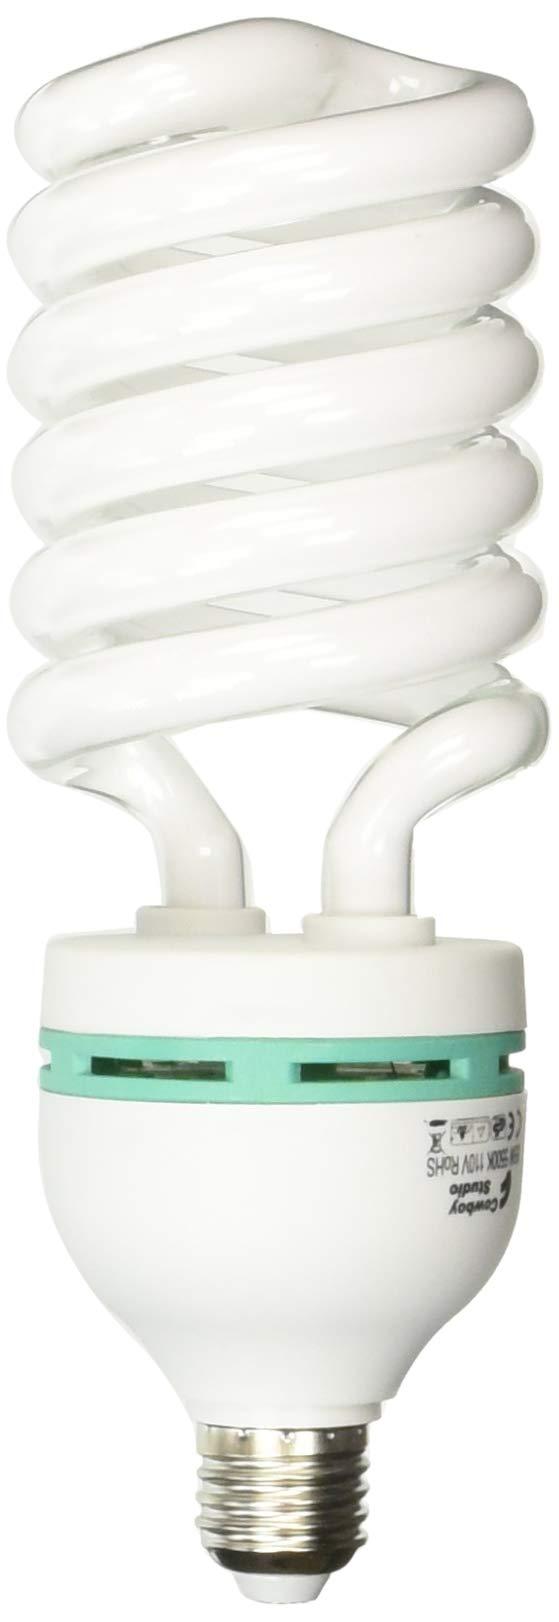 Cowboystudio Full Spectrum Light Lighting Bulb four 85 watt Photography Photo CFL 5500K - Case of 4 - daylight balanced pure white light - 4000 Lumens, Pack of 4